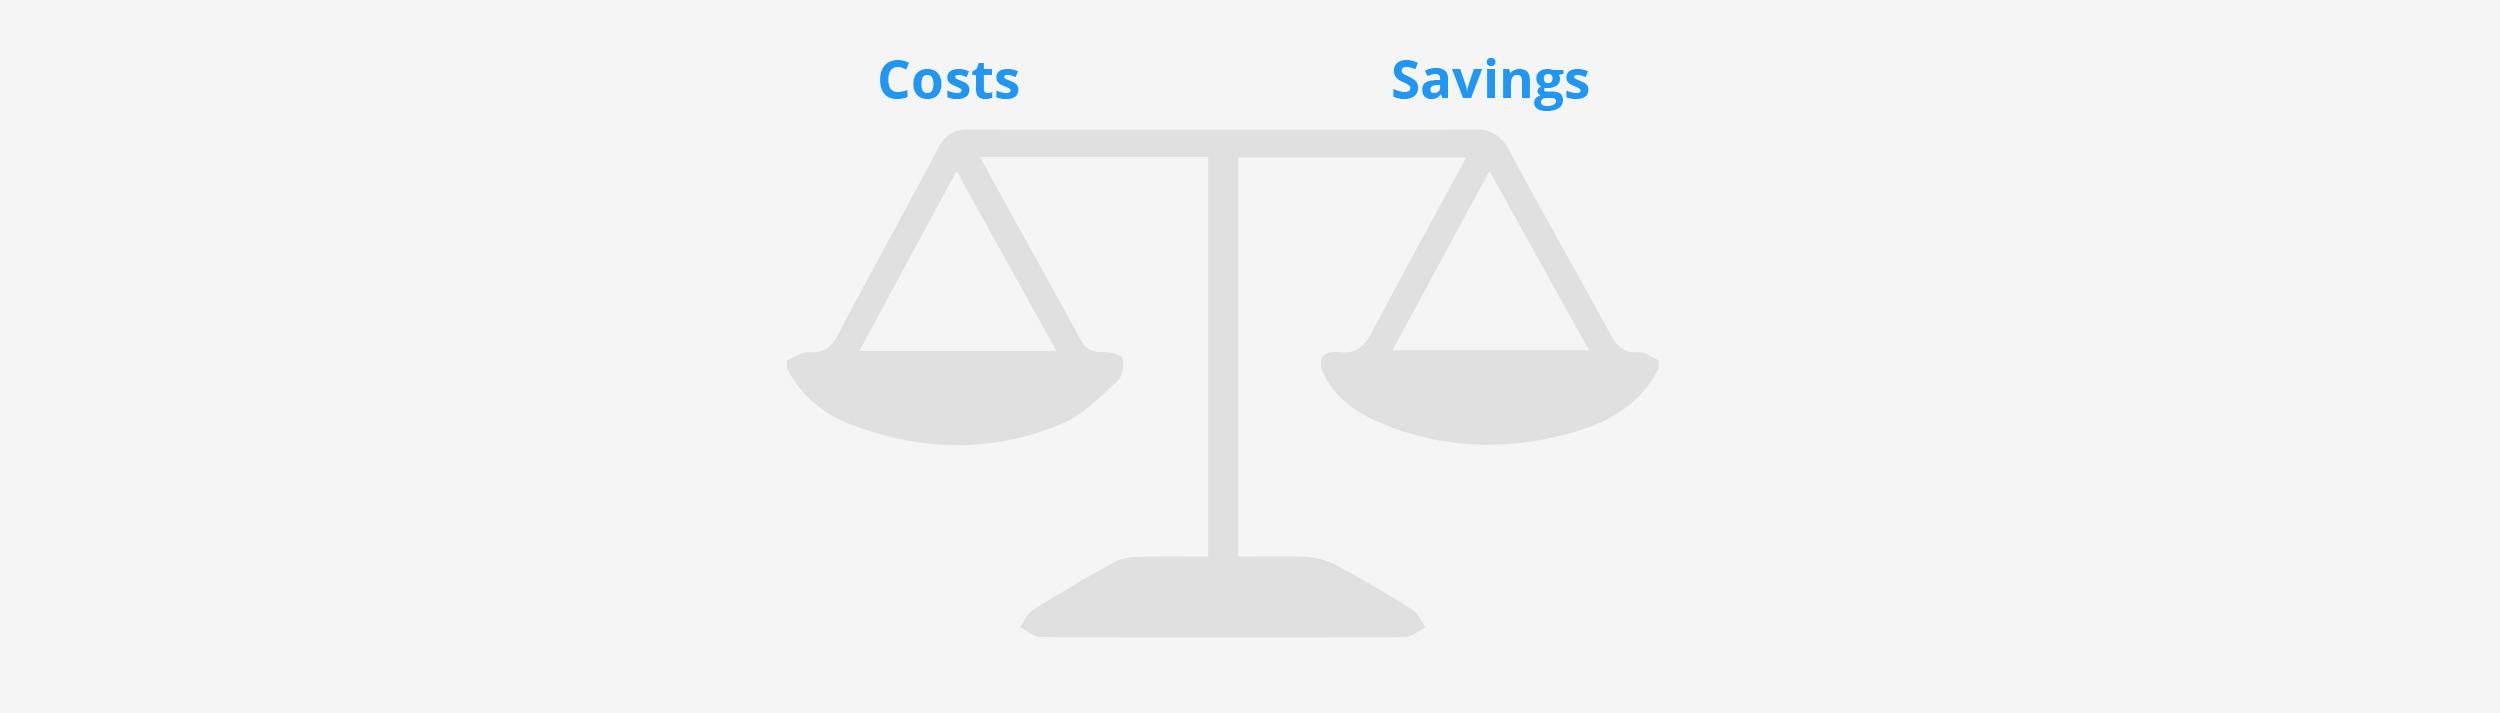 hvac software cost savings